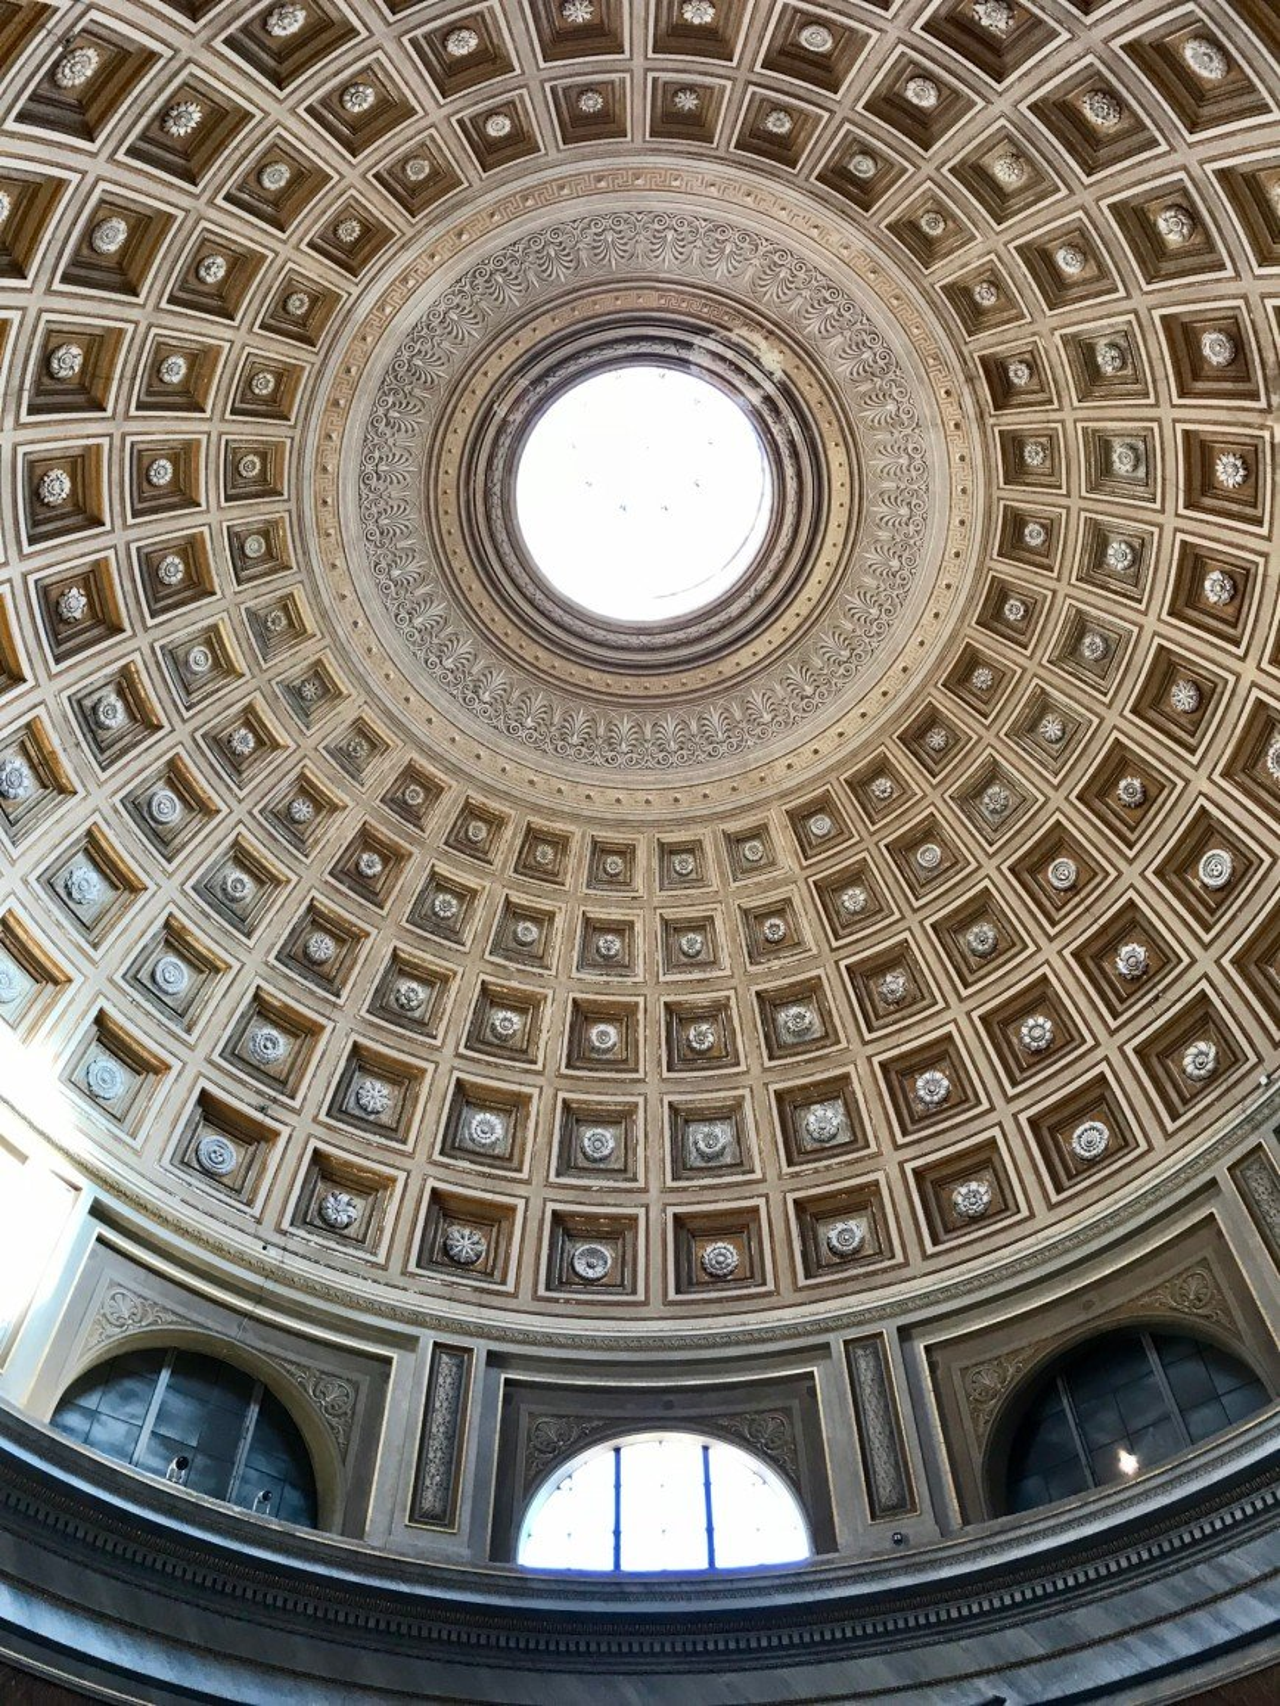 Автор: phonix, Фотозал: Туристические зарисовки, Ватикан, Рим